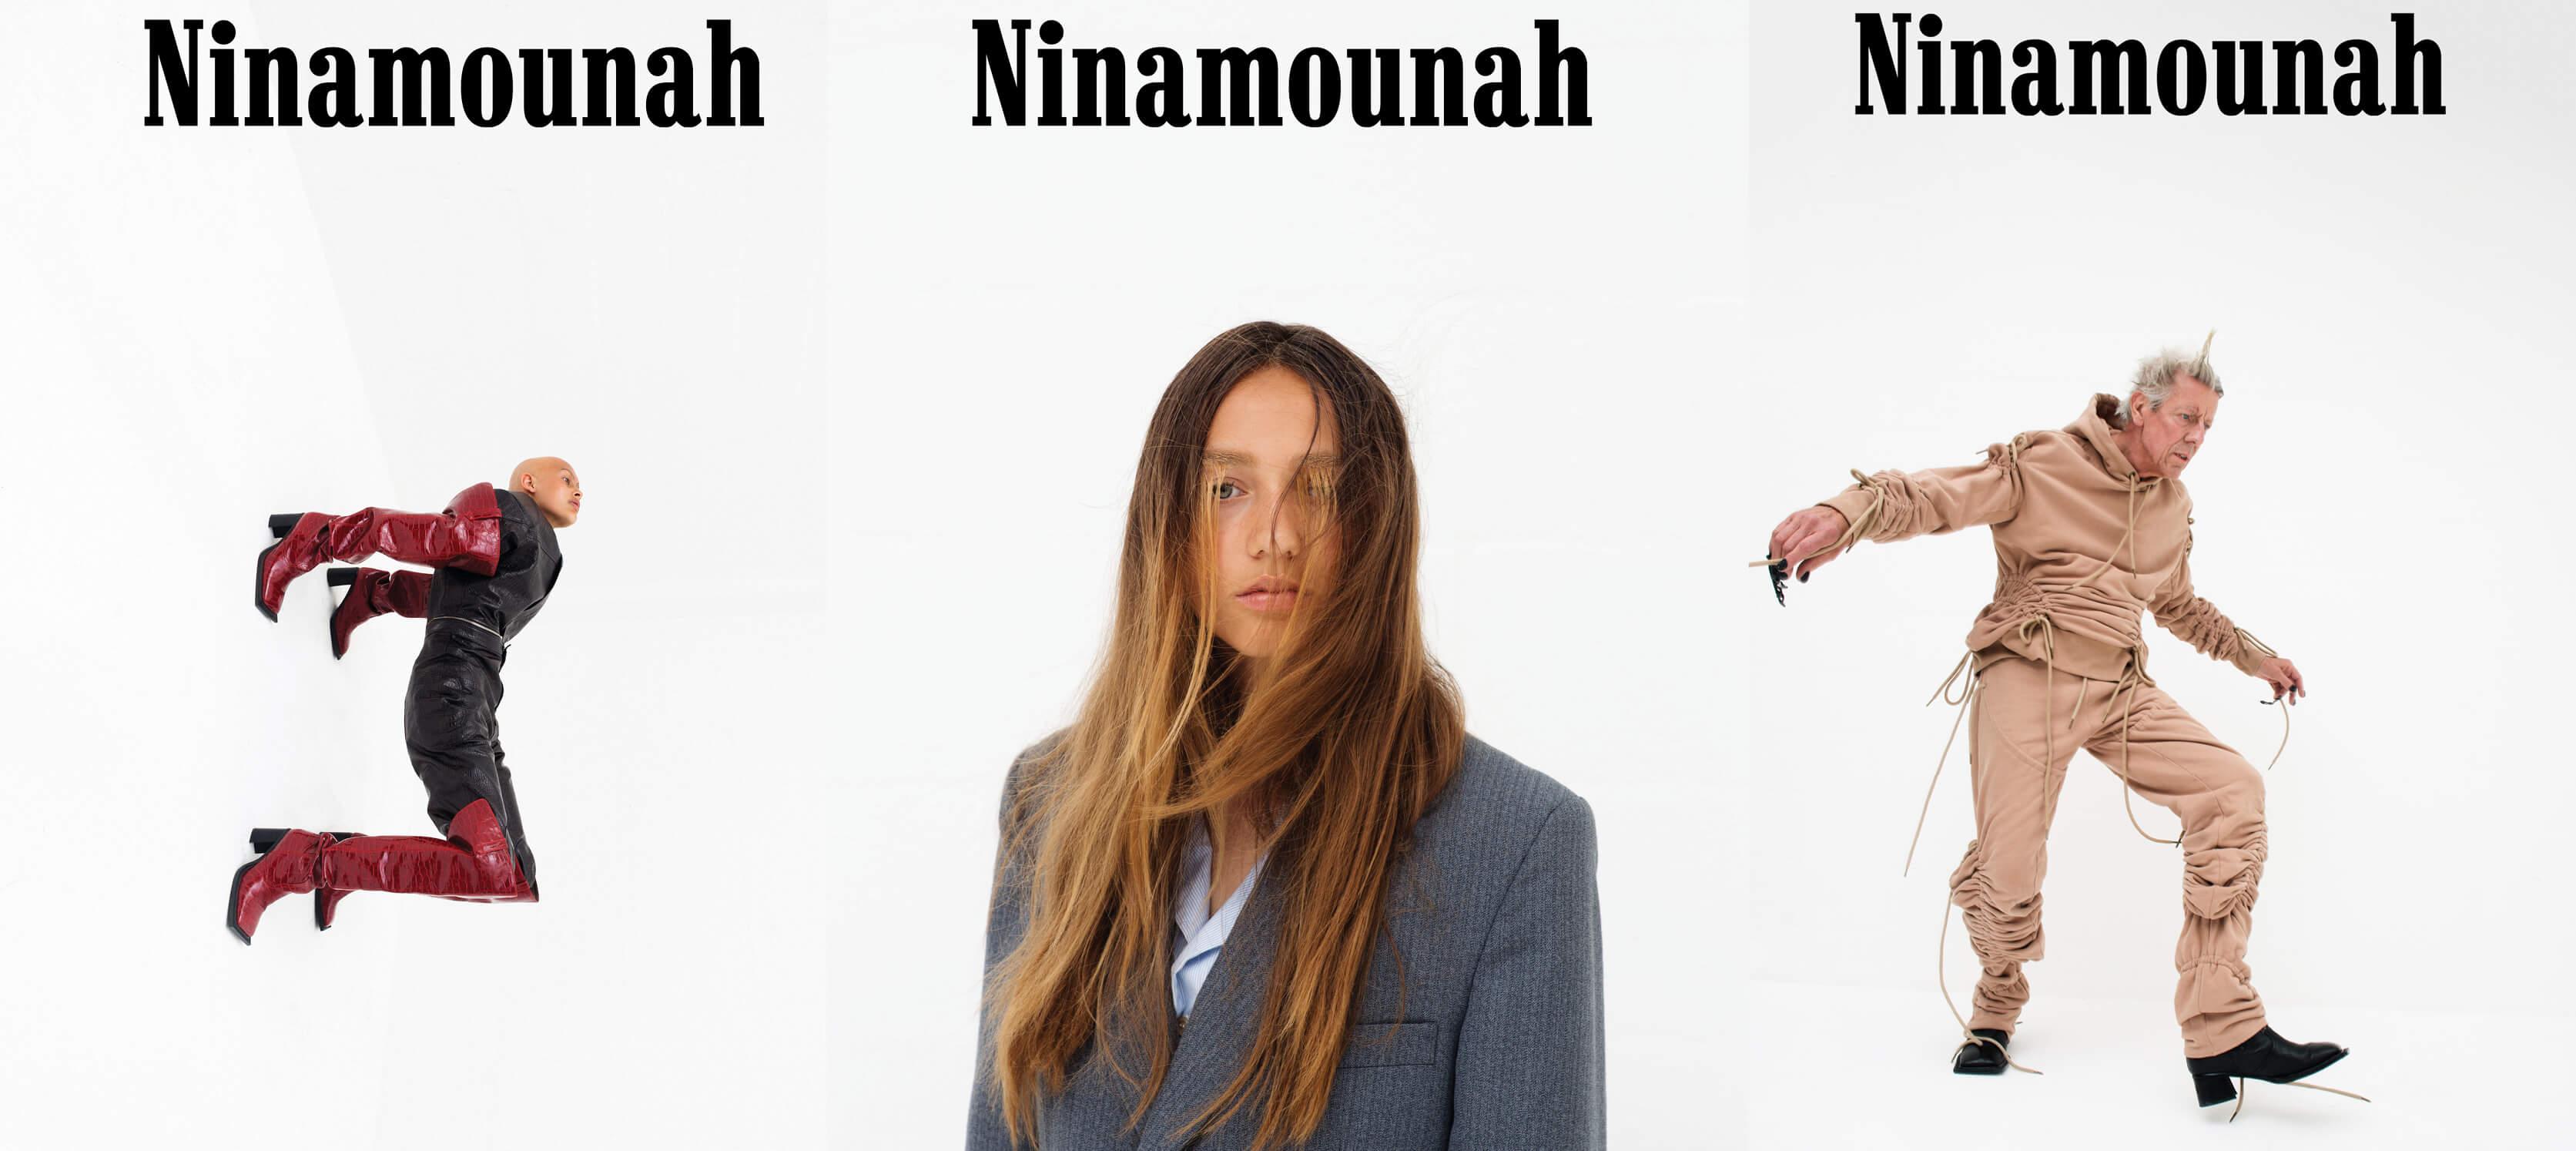 Philips en Ninamounah Presenteren de MuseSeriesCampagne